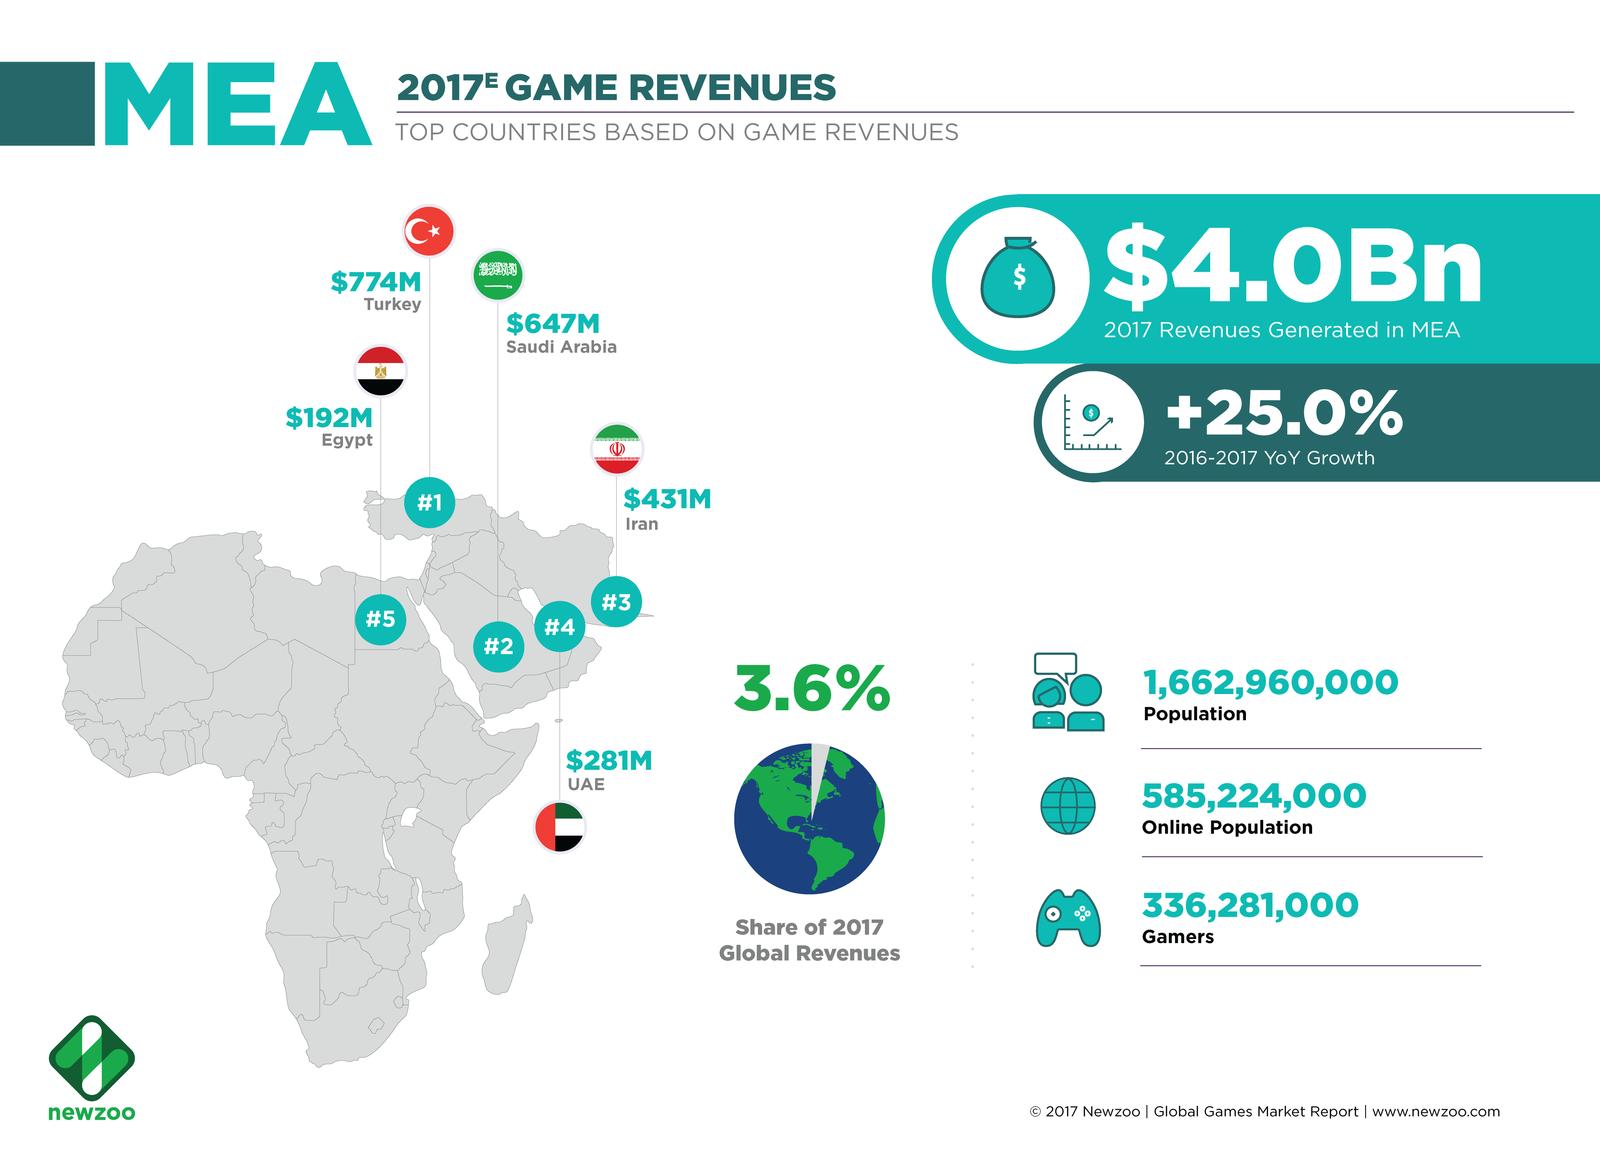 MEA Game Revenues 2017